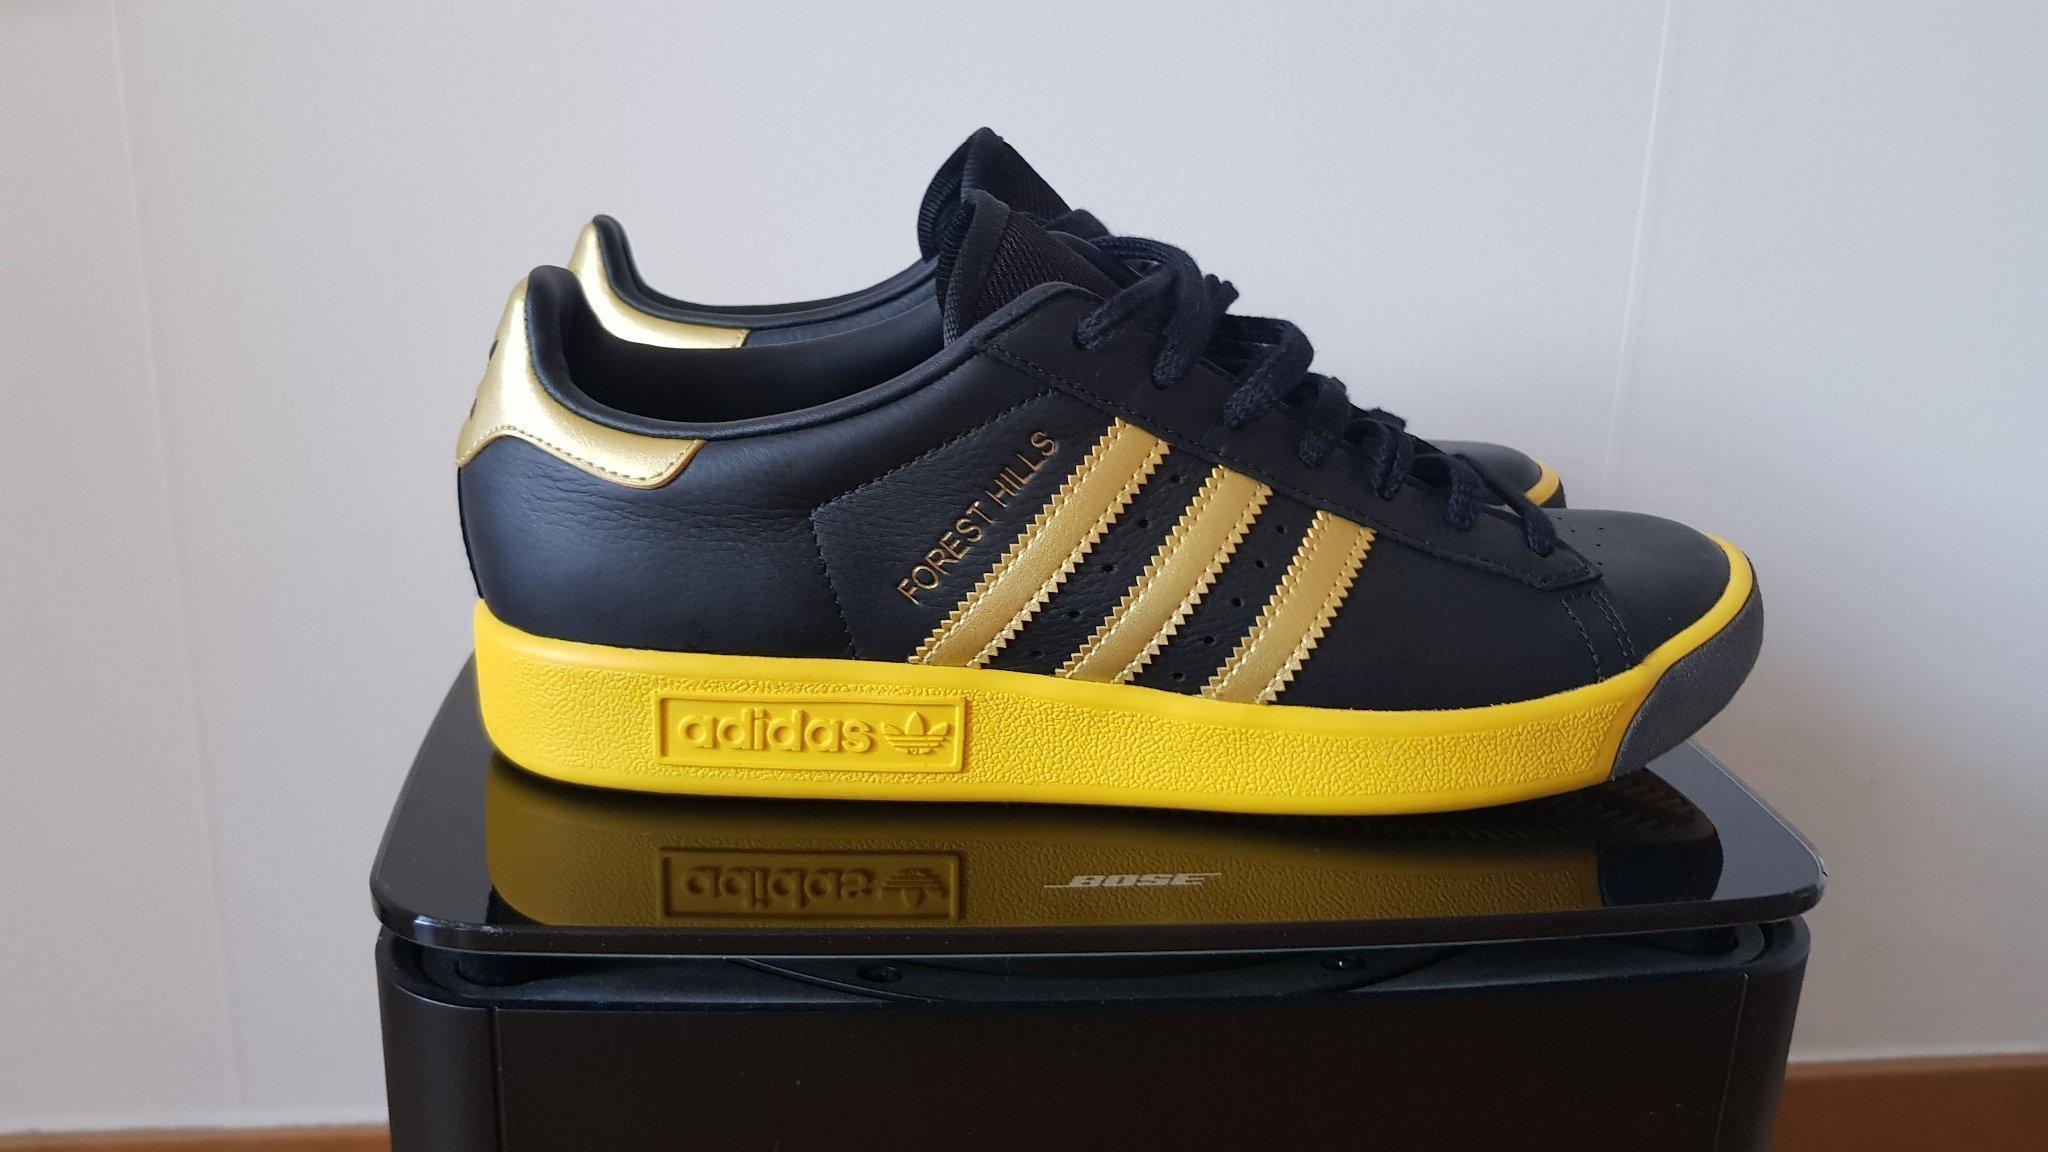 sports shoes 3b545 e172c Adidas skor storlek 42 (2 3) forest hills svart guld gul sneakers gympasko